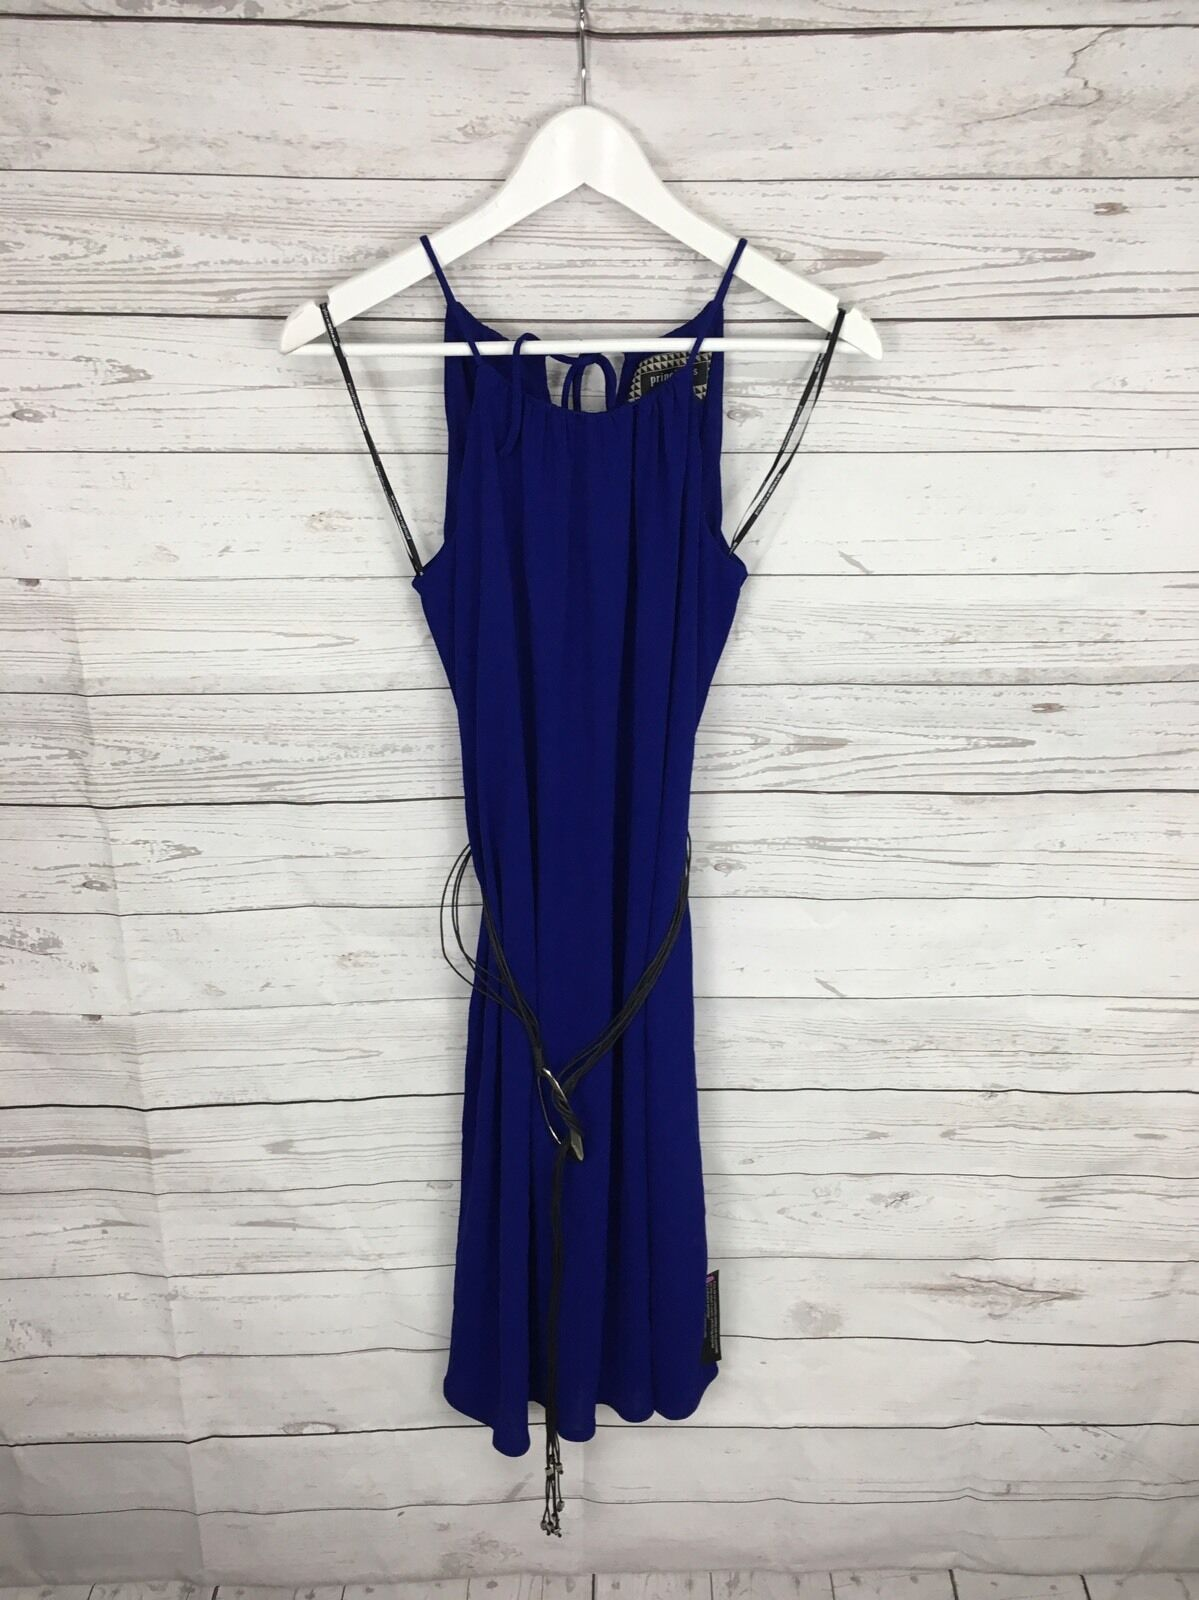 e51796b0 Principles Ben de Lisi Dress - UK8 - New with Tags Women's By ocxnmc6311- Dresses